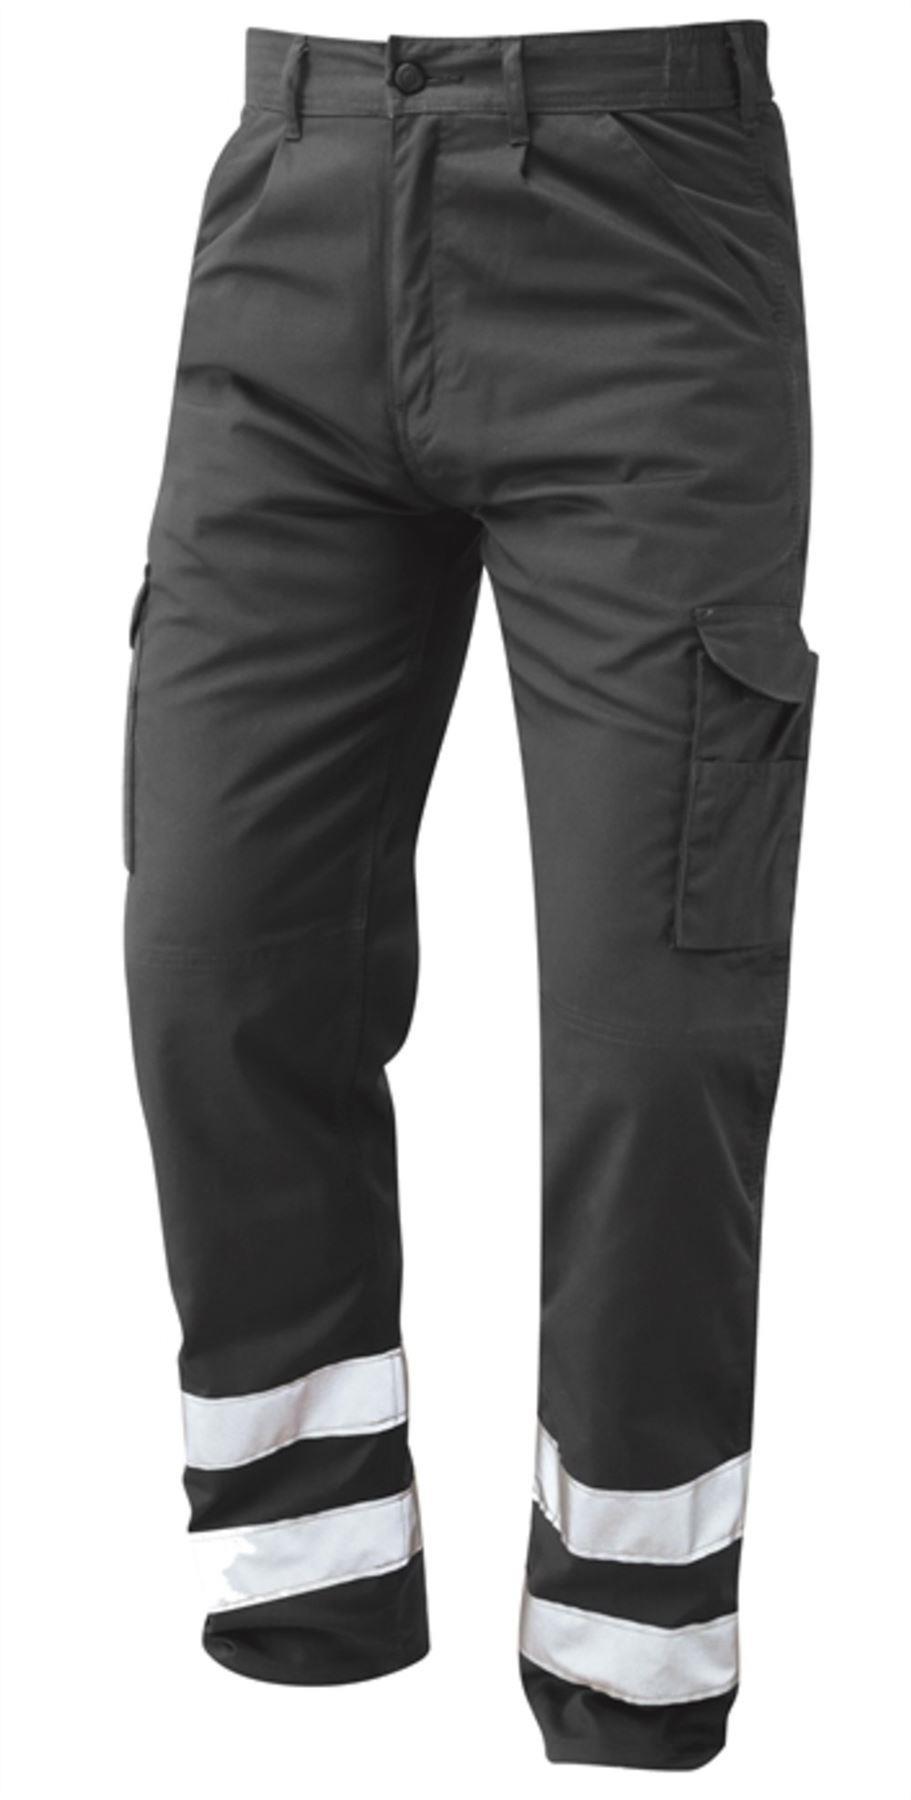 Orn Condor Hi Vis Kneepad Trousers - Graphite Grey|42W32L